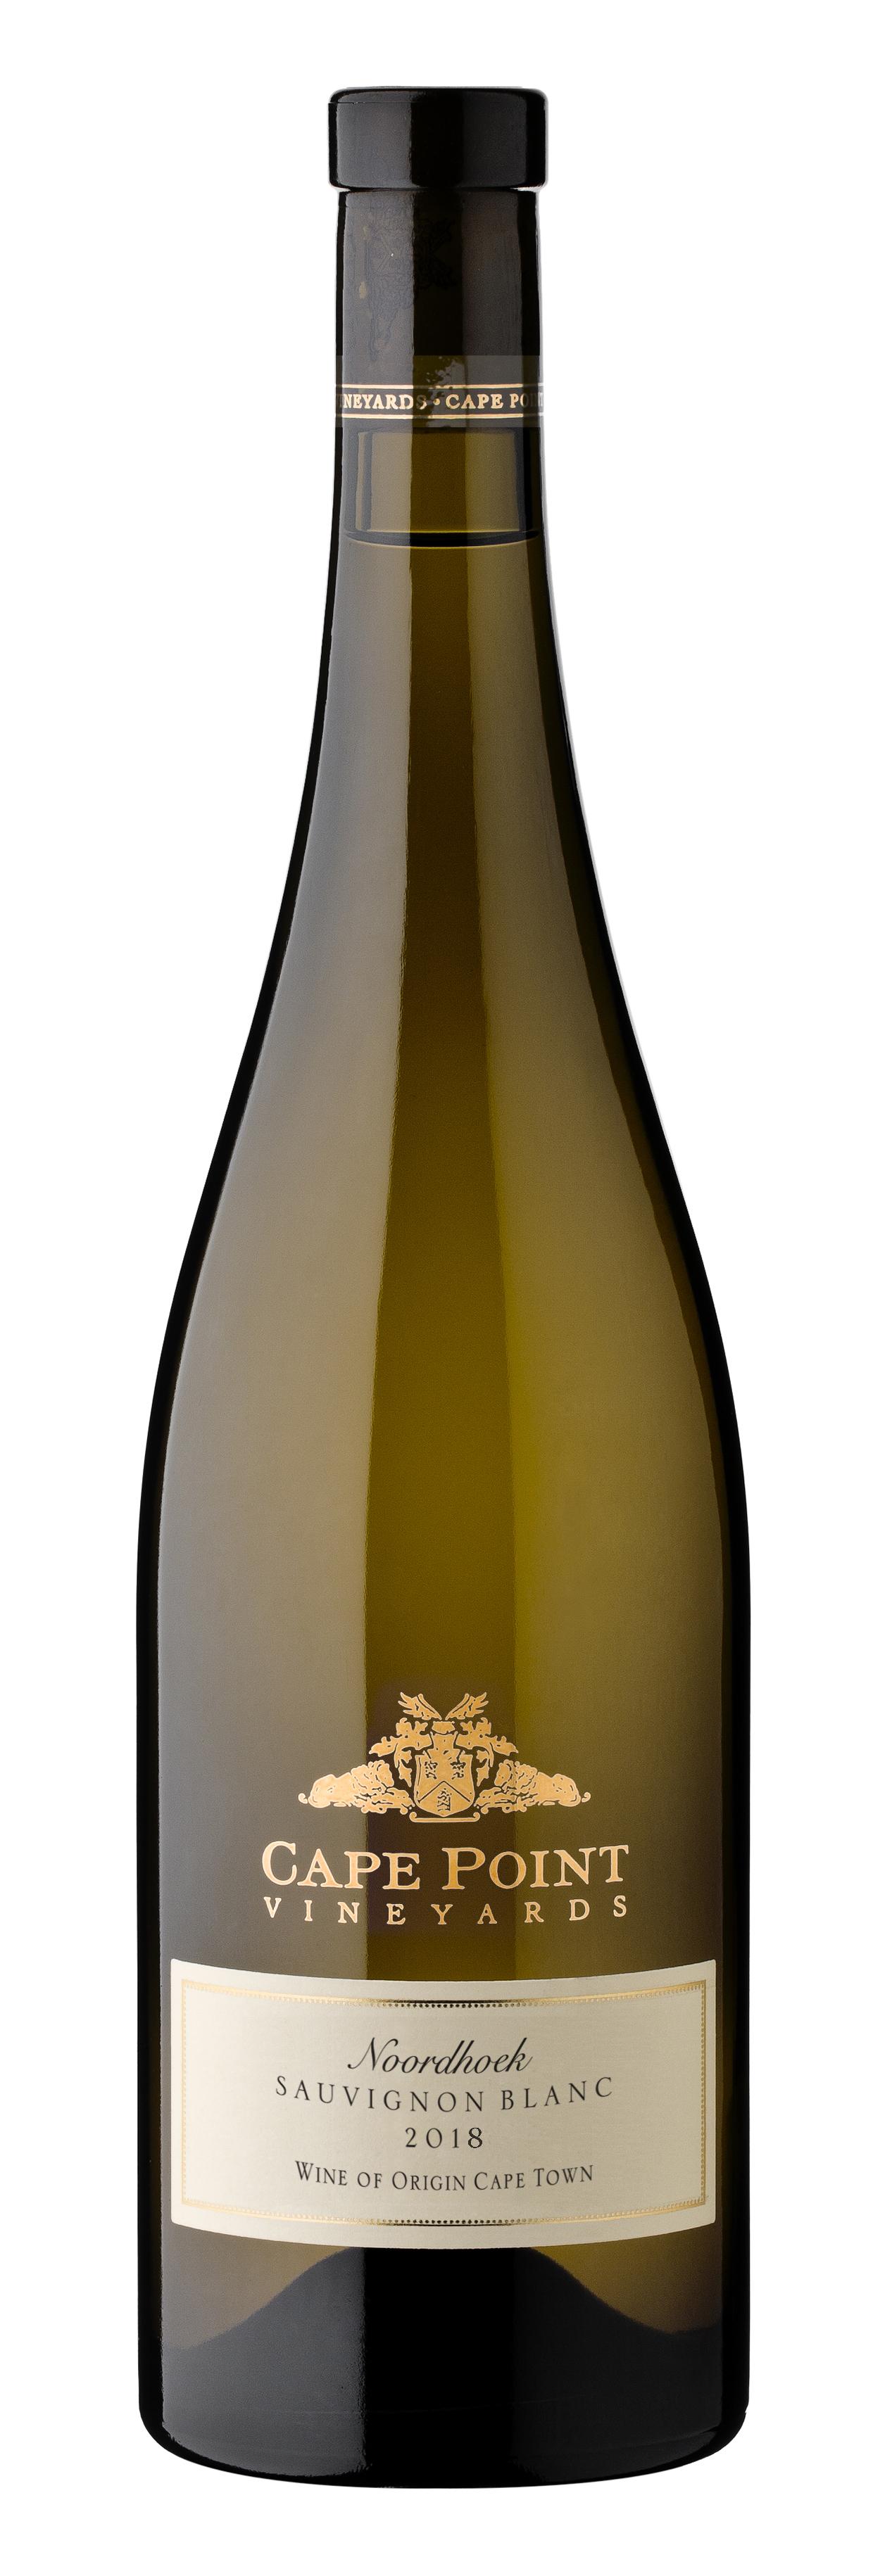 Noordhoek Sauvignon Blanc